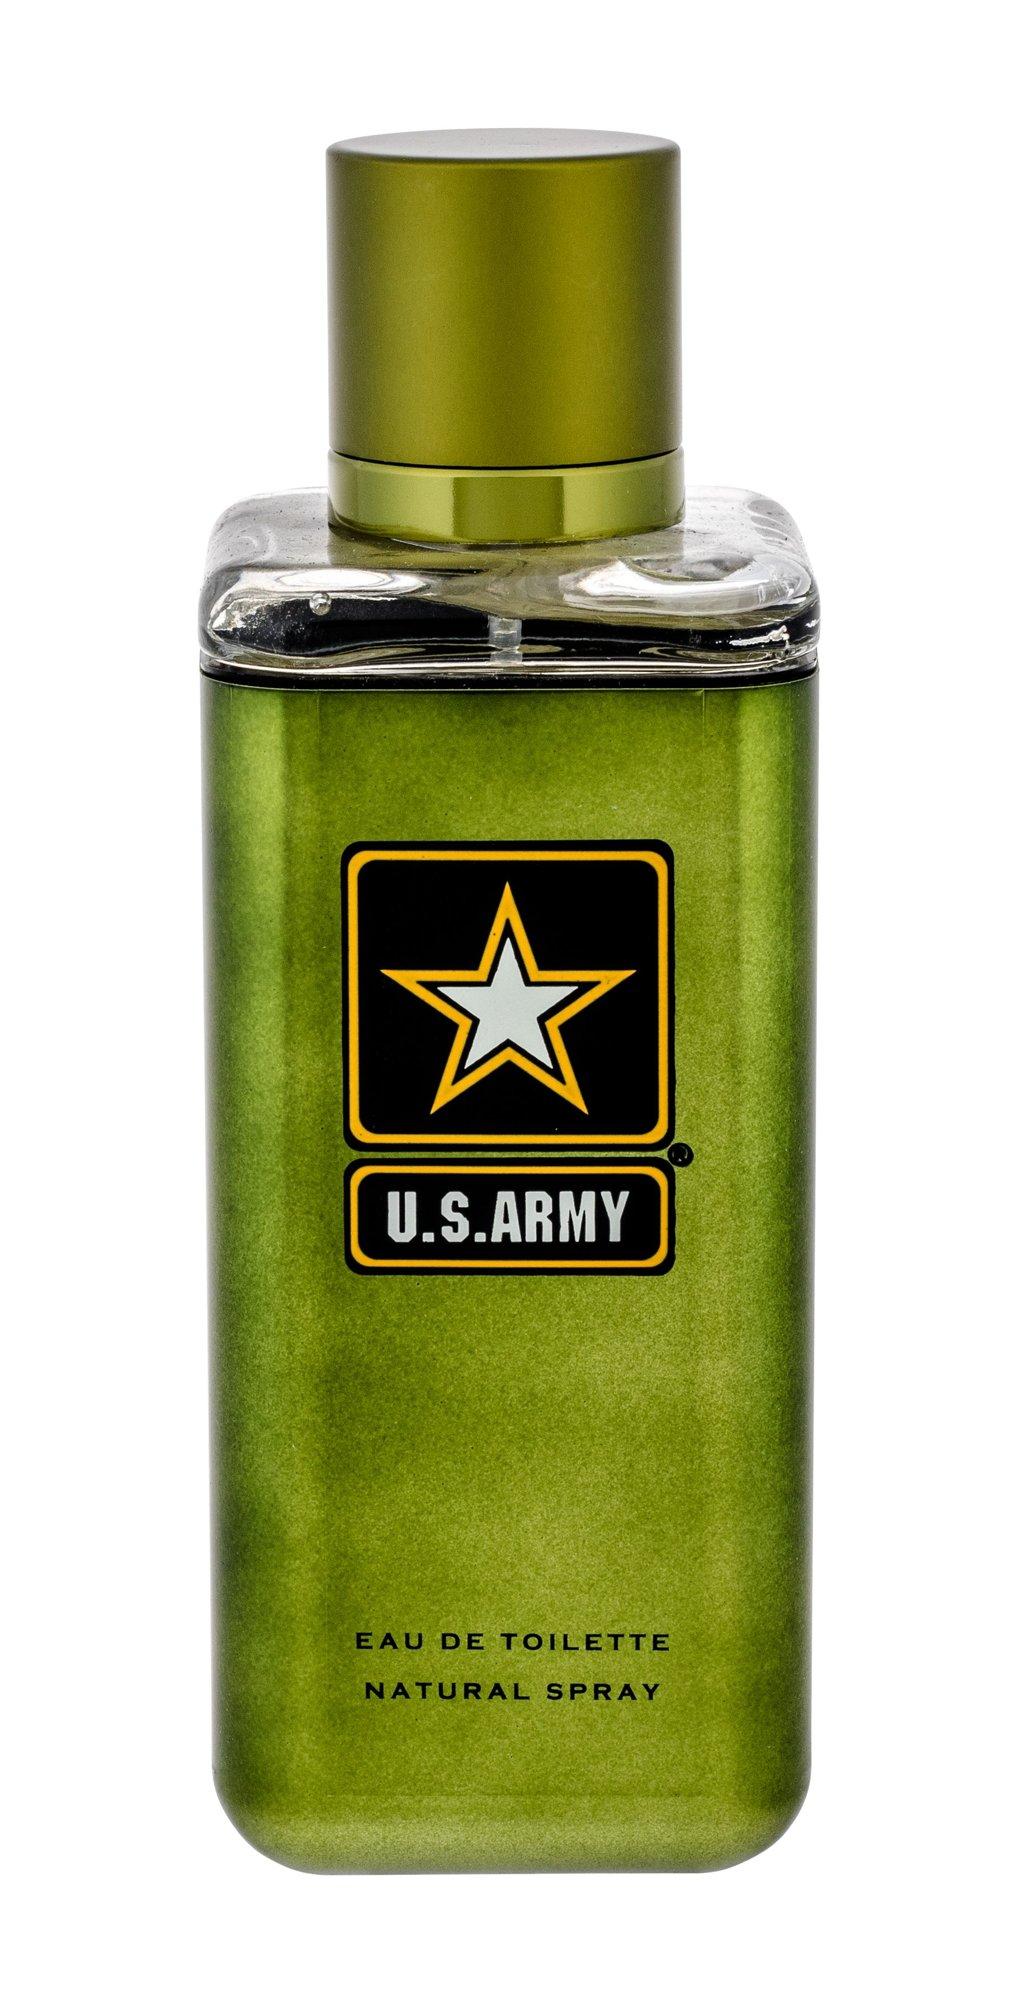 U.S.Army Green